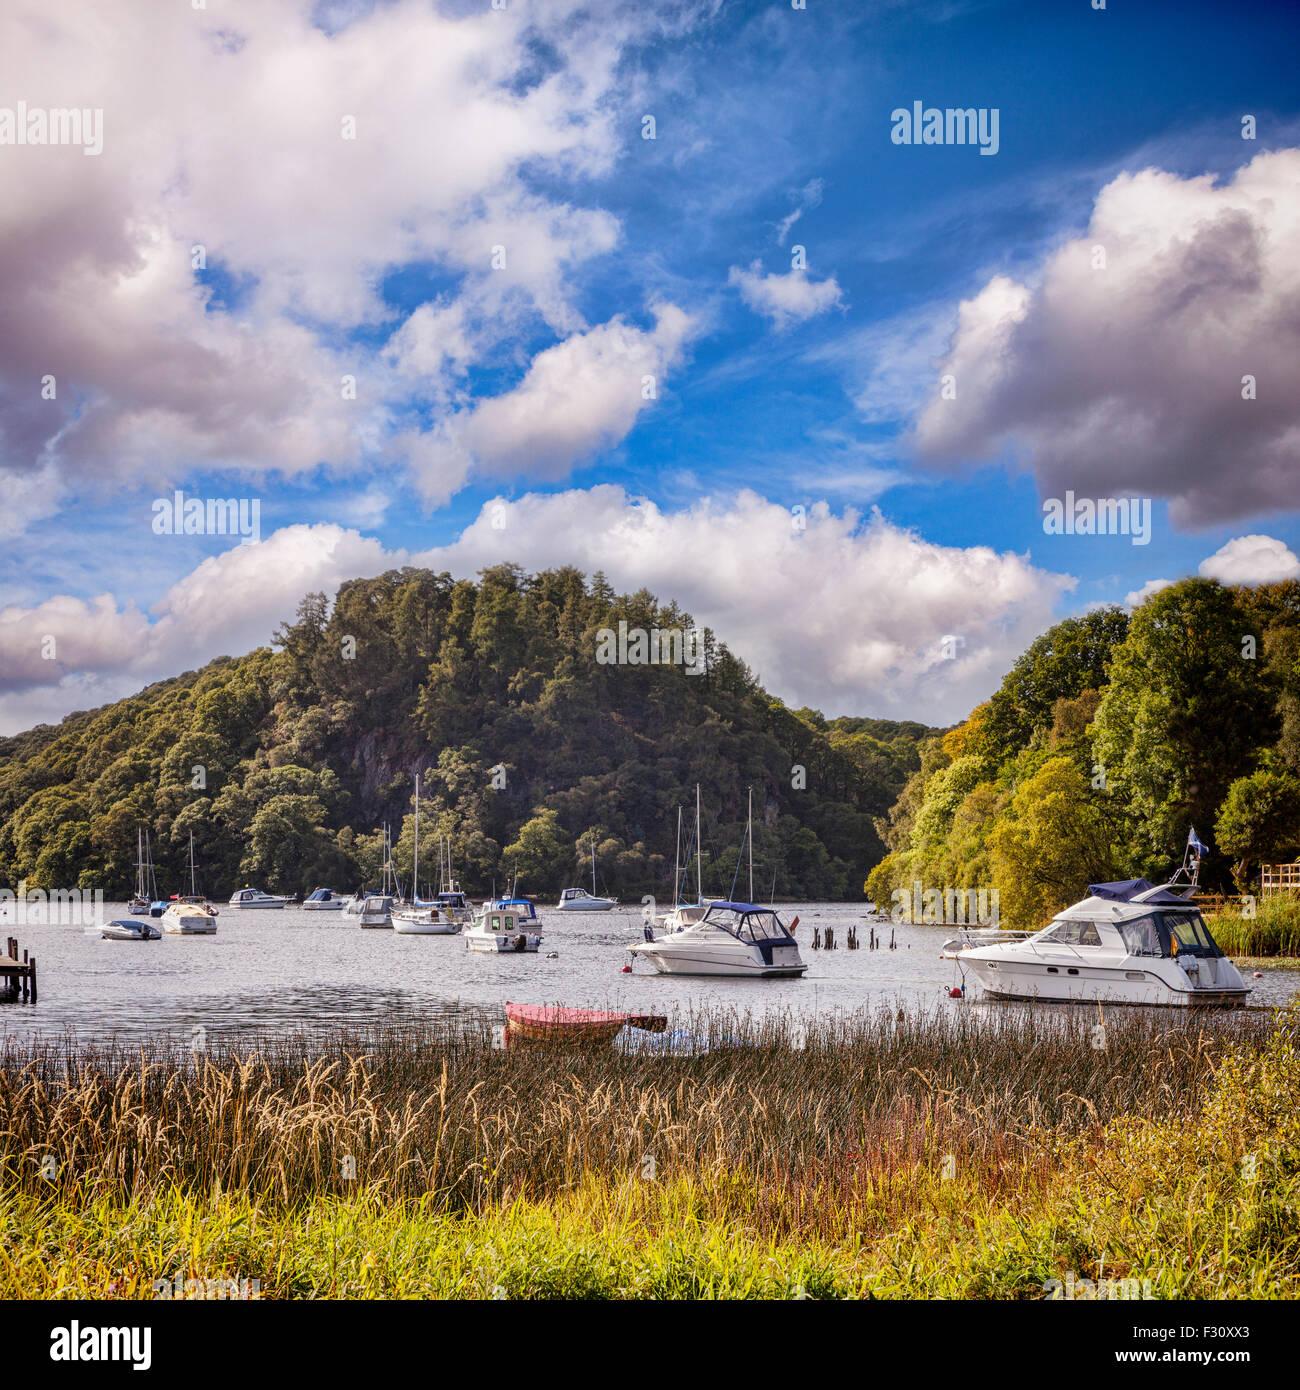 Port de Balmaha, Loch Lomond, Stirlingshire, Scotland, UK. Photo Stock